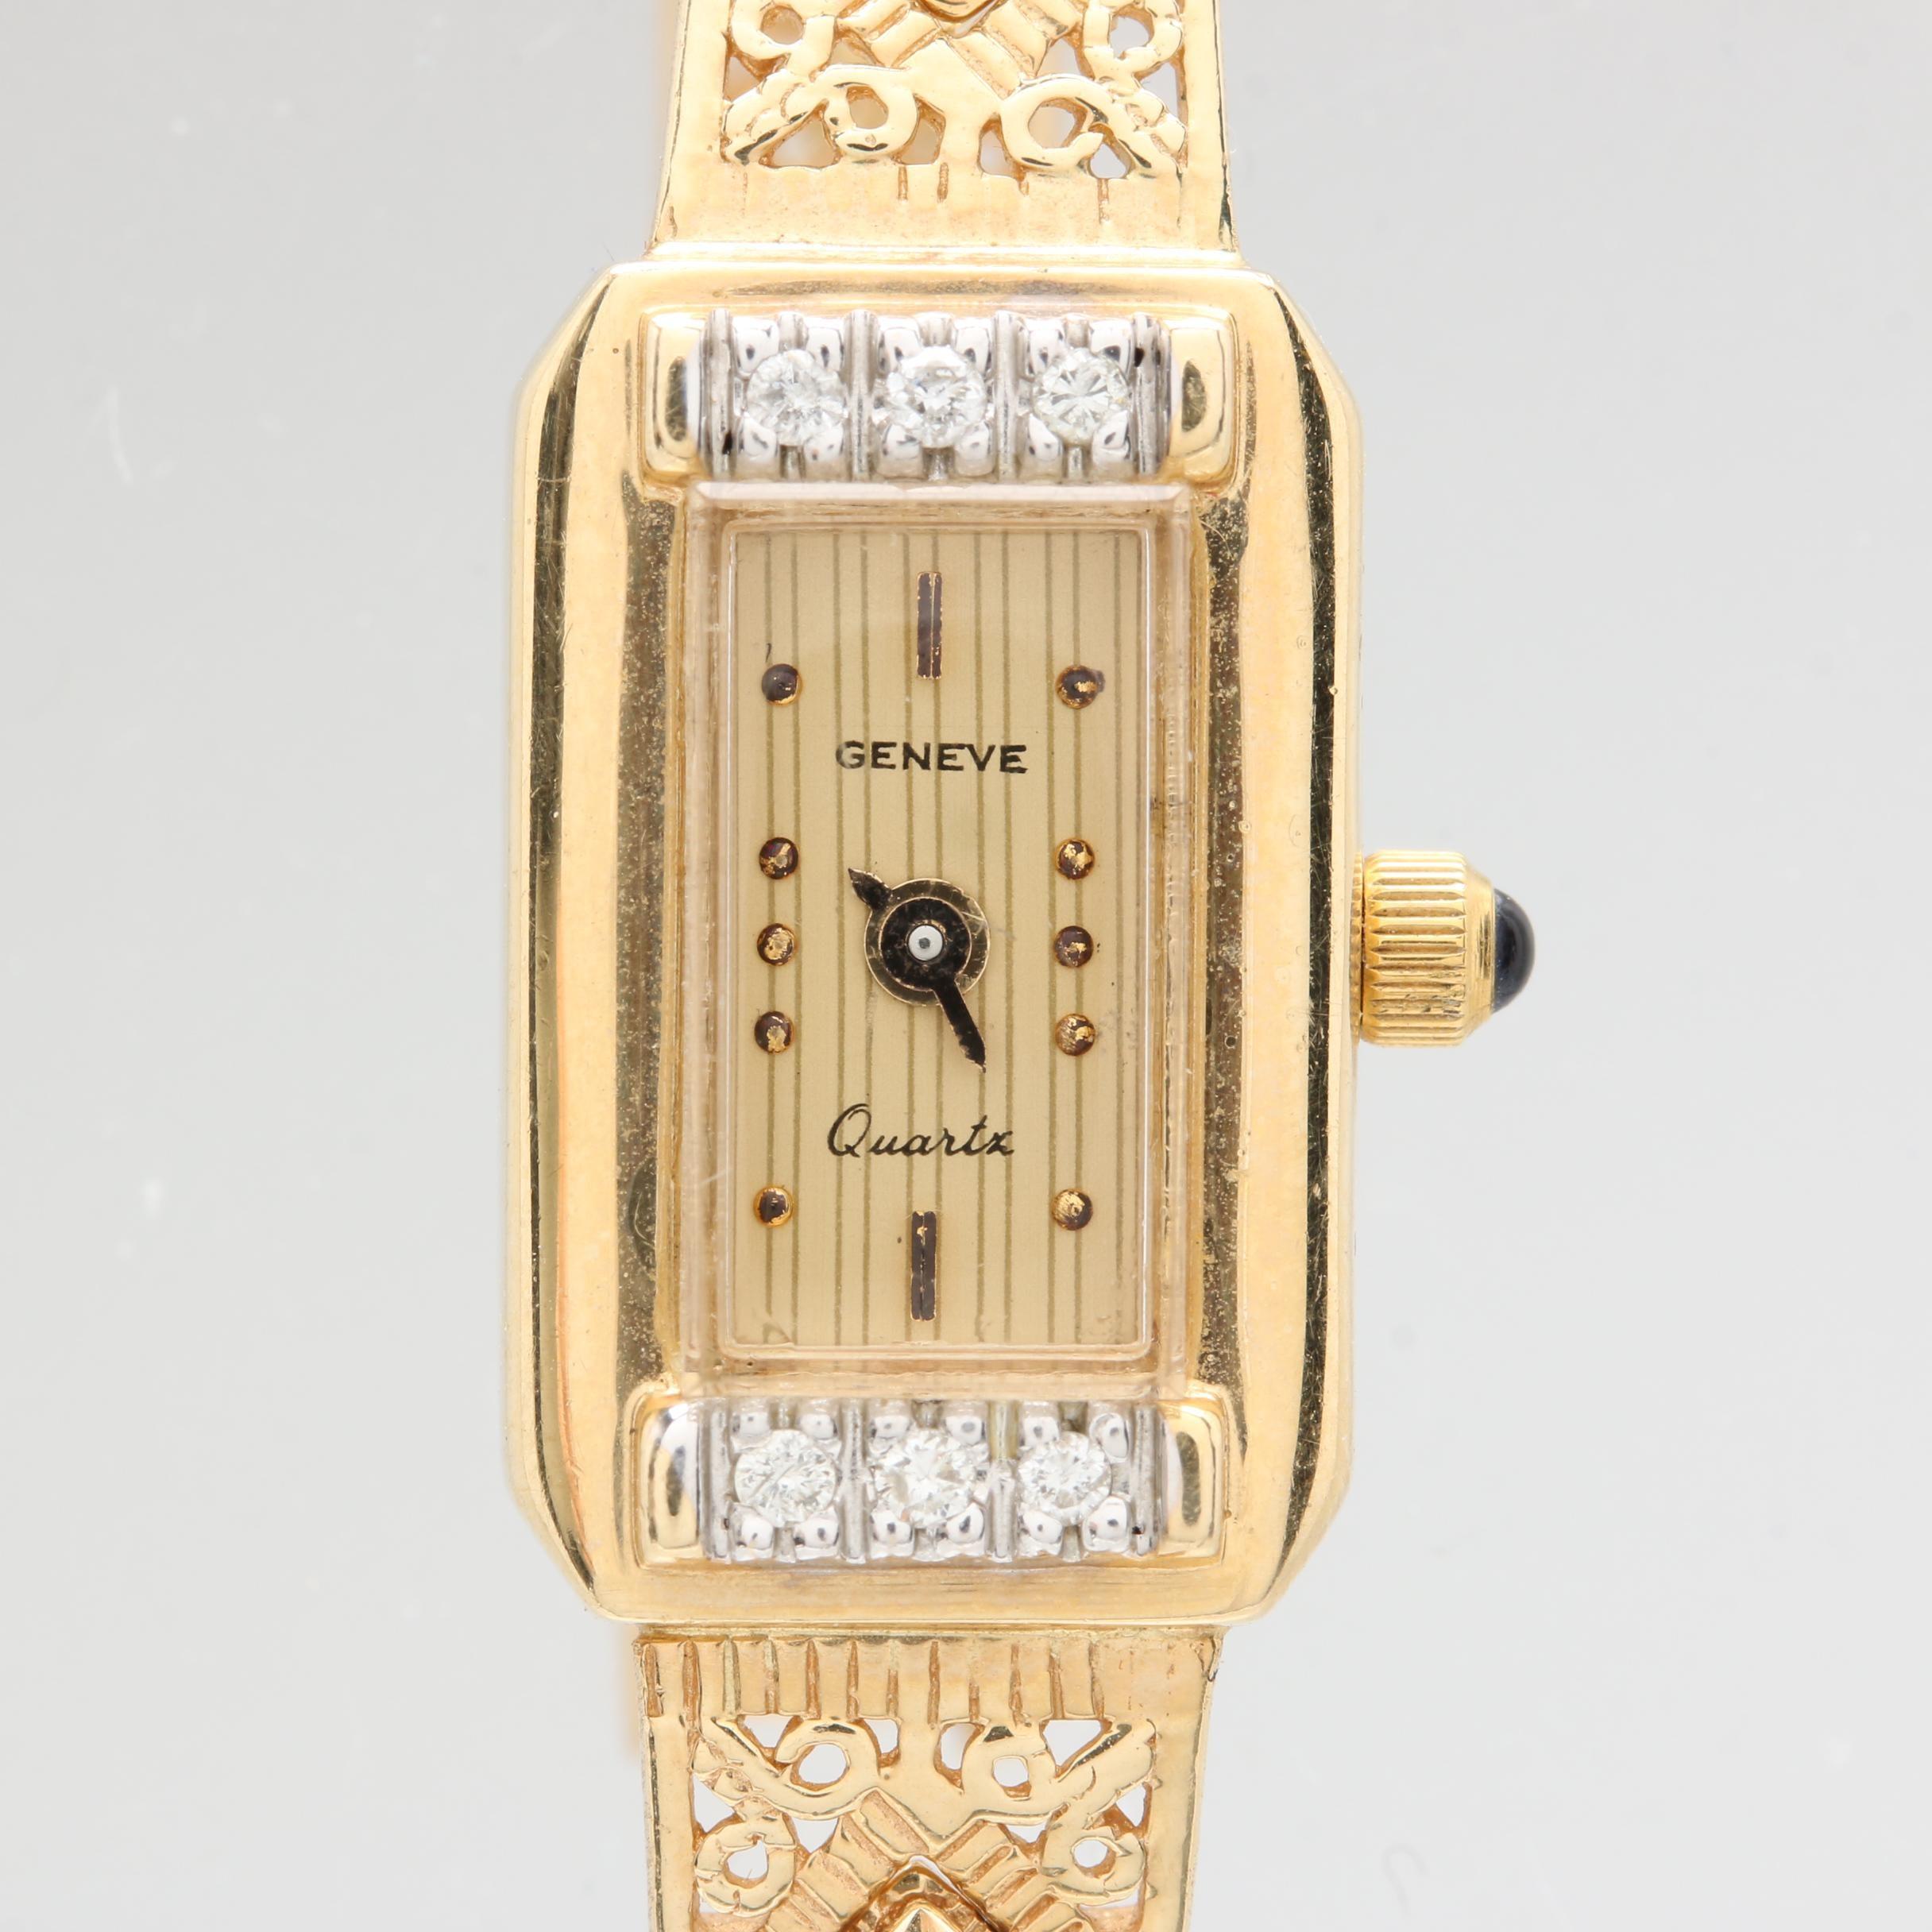 Geneve Quartz 14K Yellow Gold Diamond Wristwatch